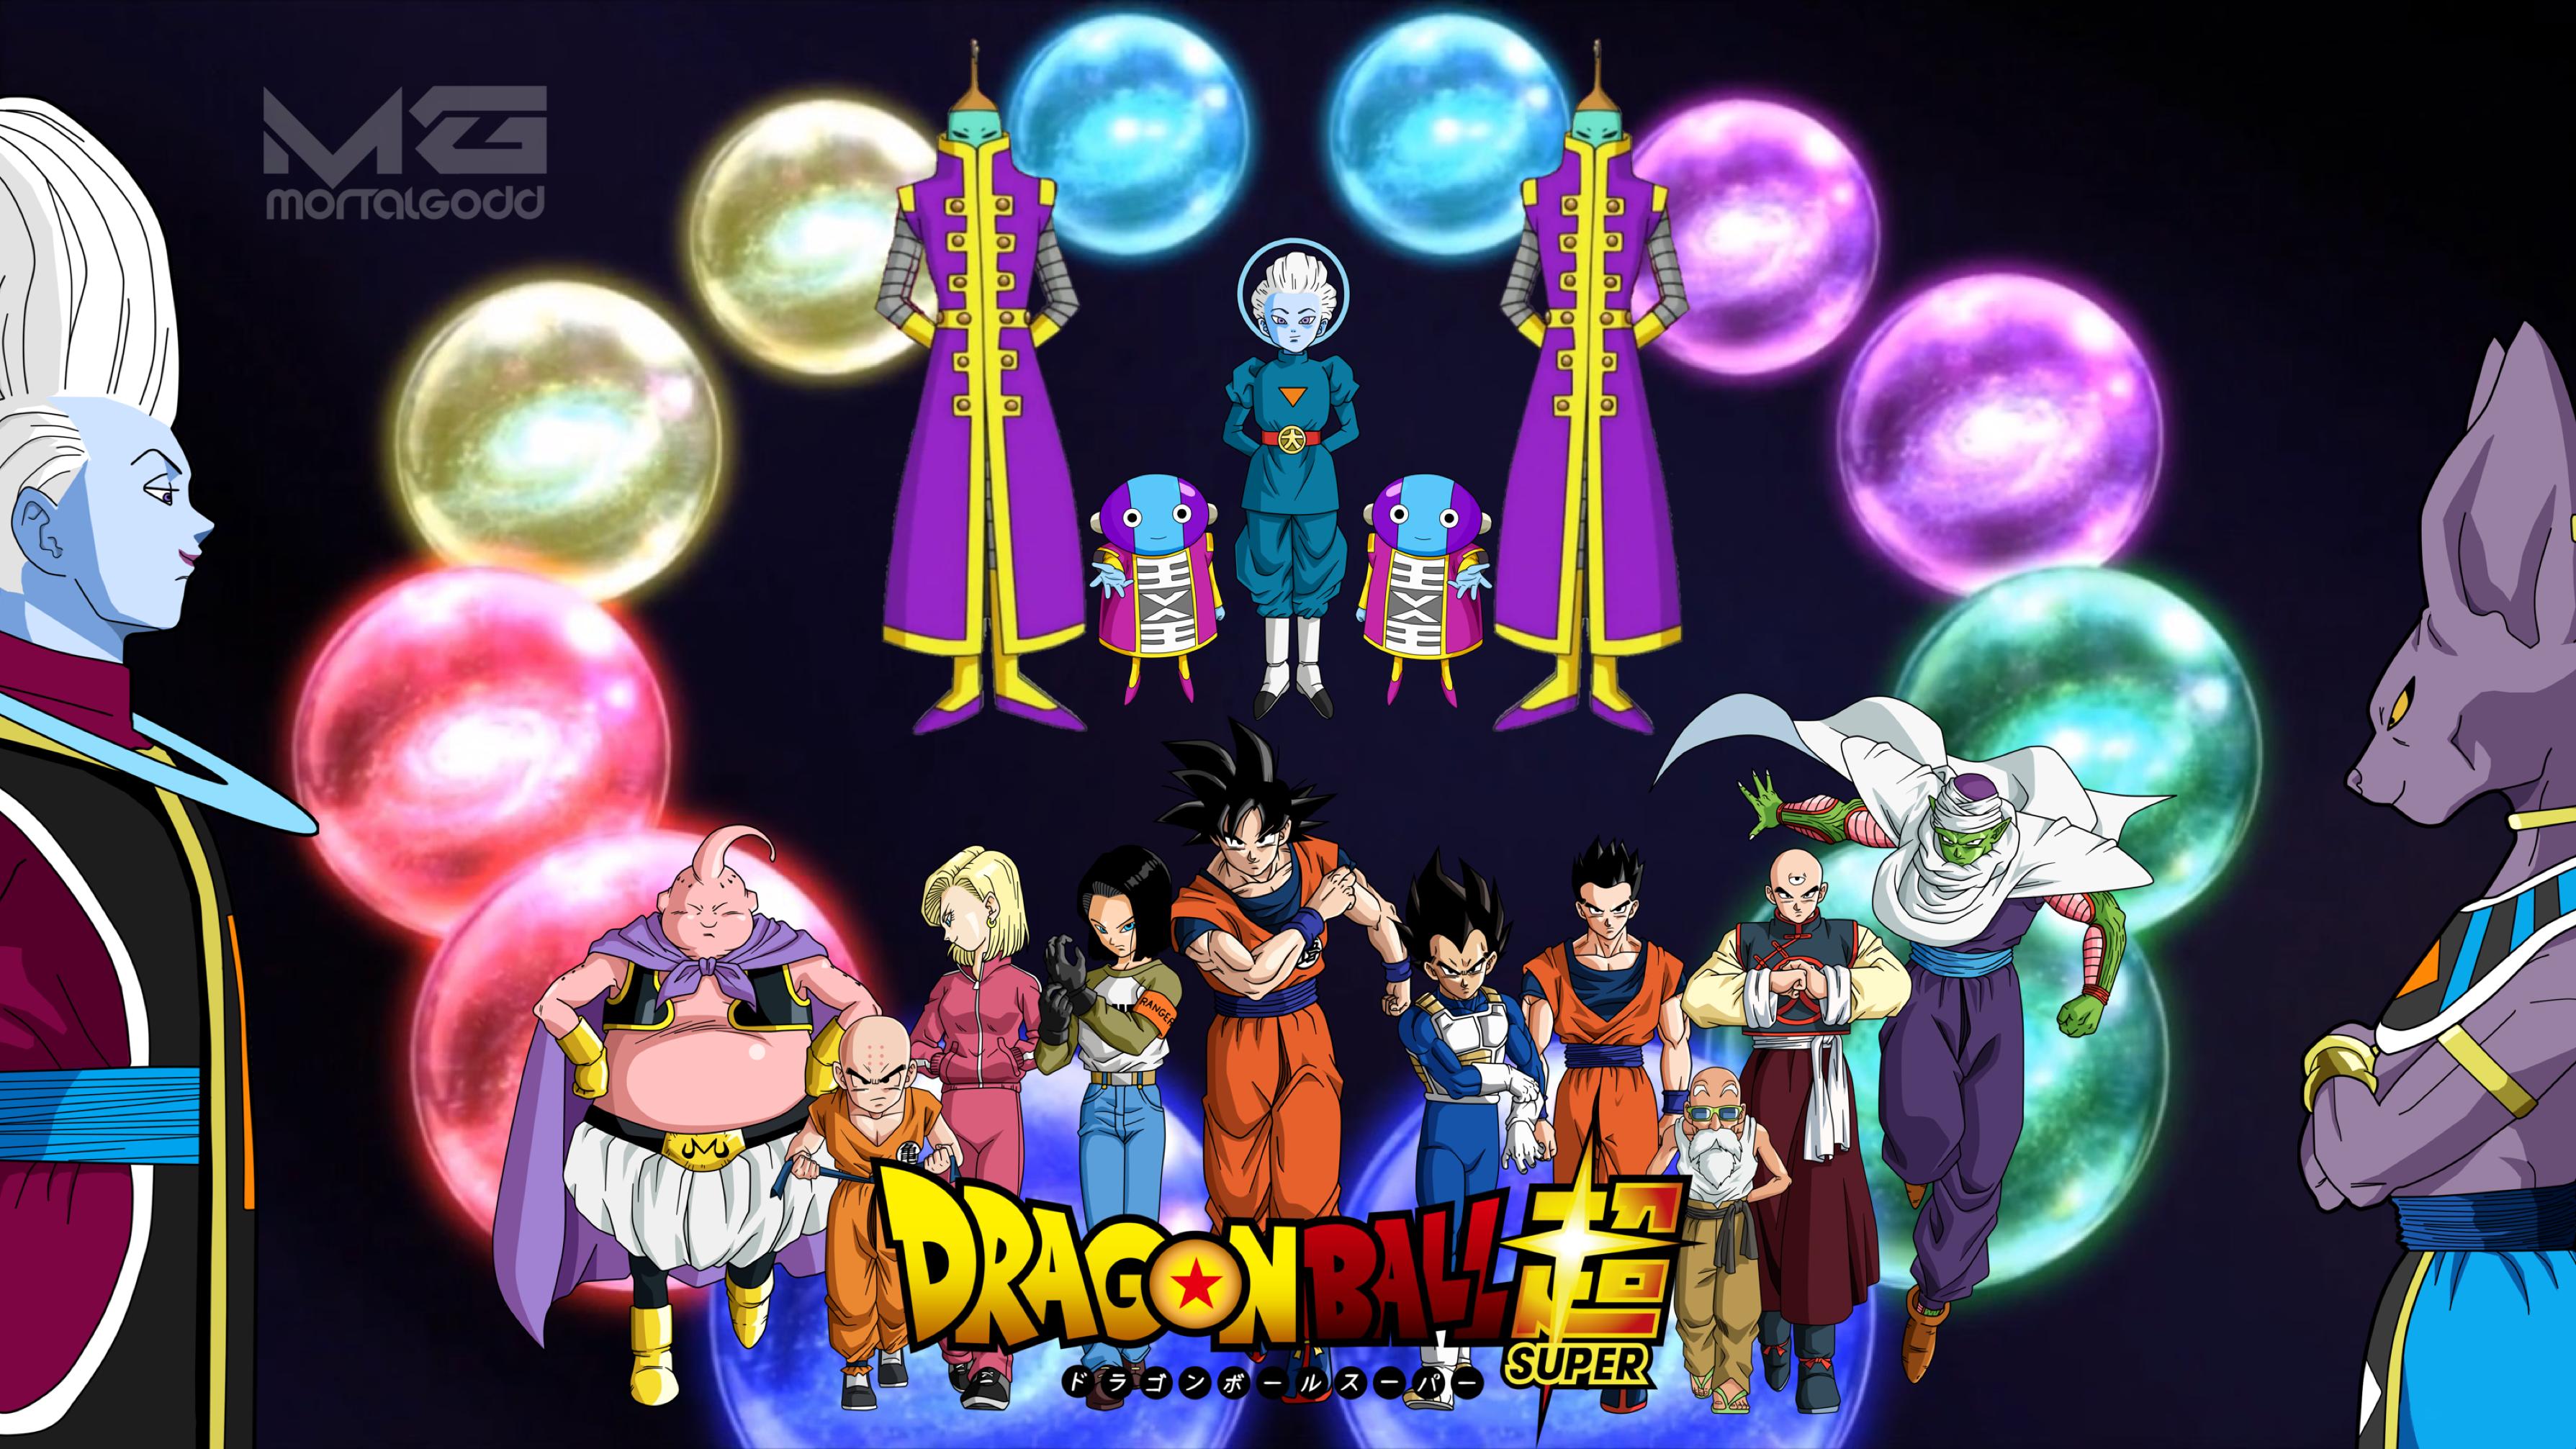 Dragon Ball Super Universe Survival Arc Wallpaper By Mortalgodd On